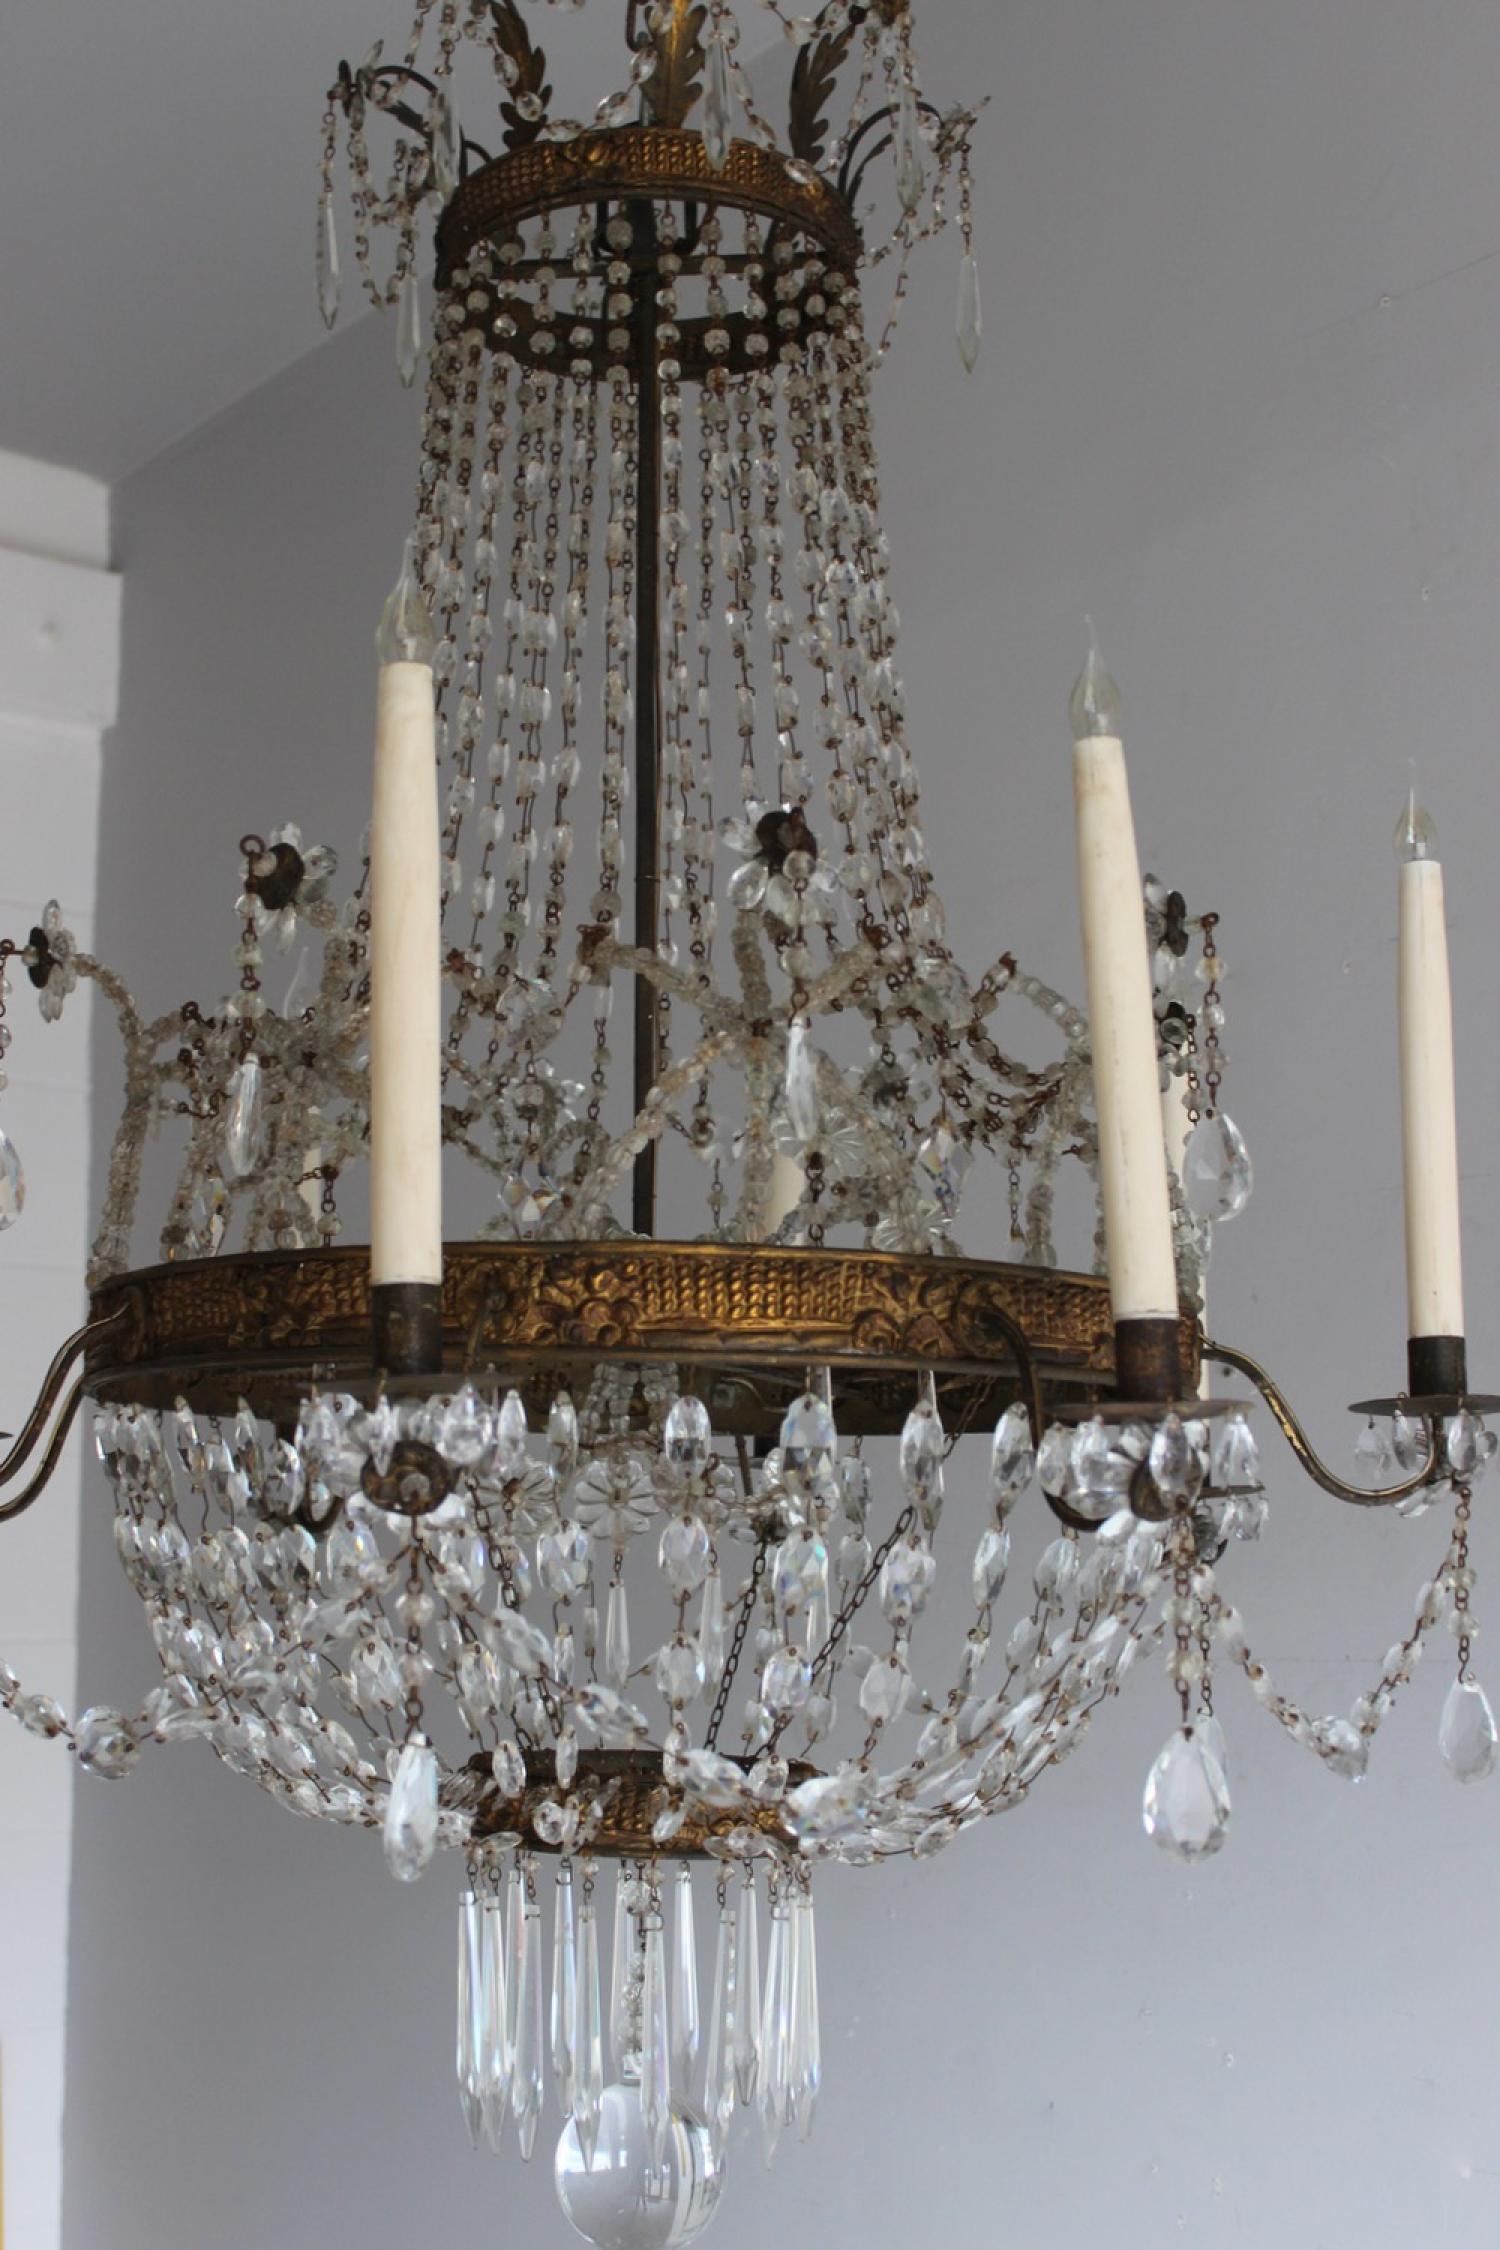 Italian antique chandeliers norfolk decorative antiques italian antique chandeliers image 6 arubaitofo Choice Image